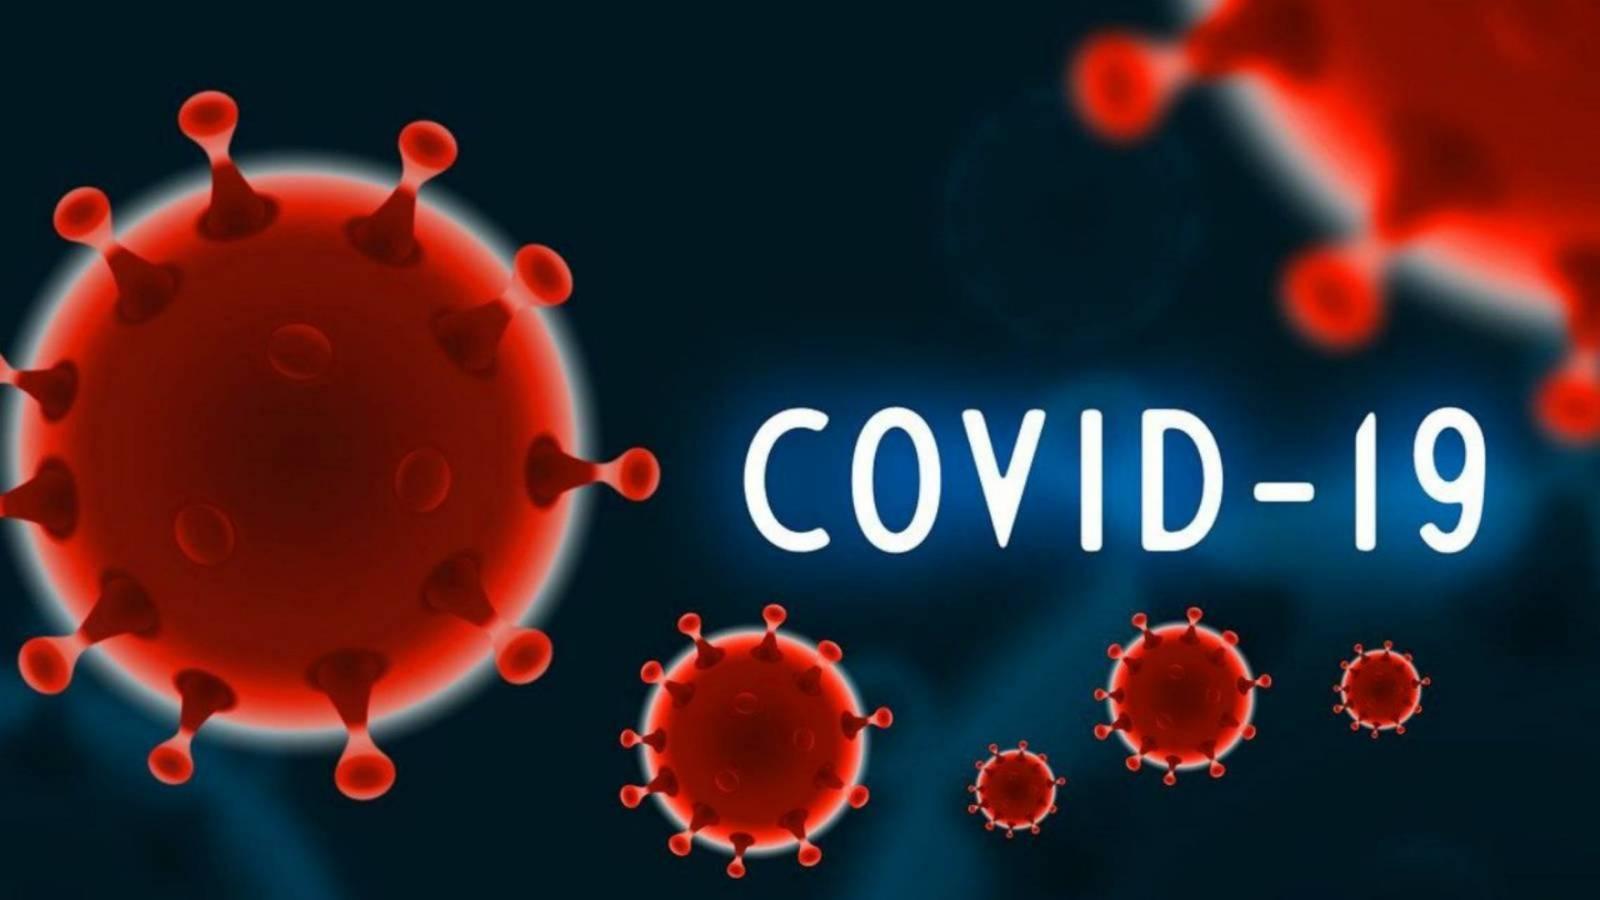 COVID-19 Romania RECORD URIAS Decese